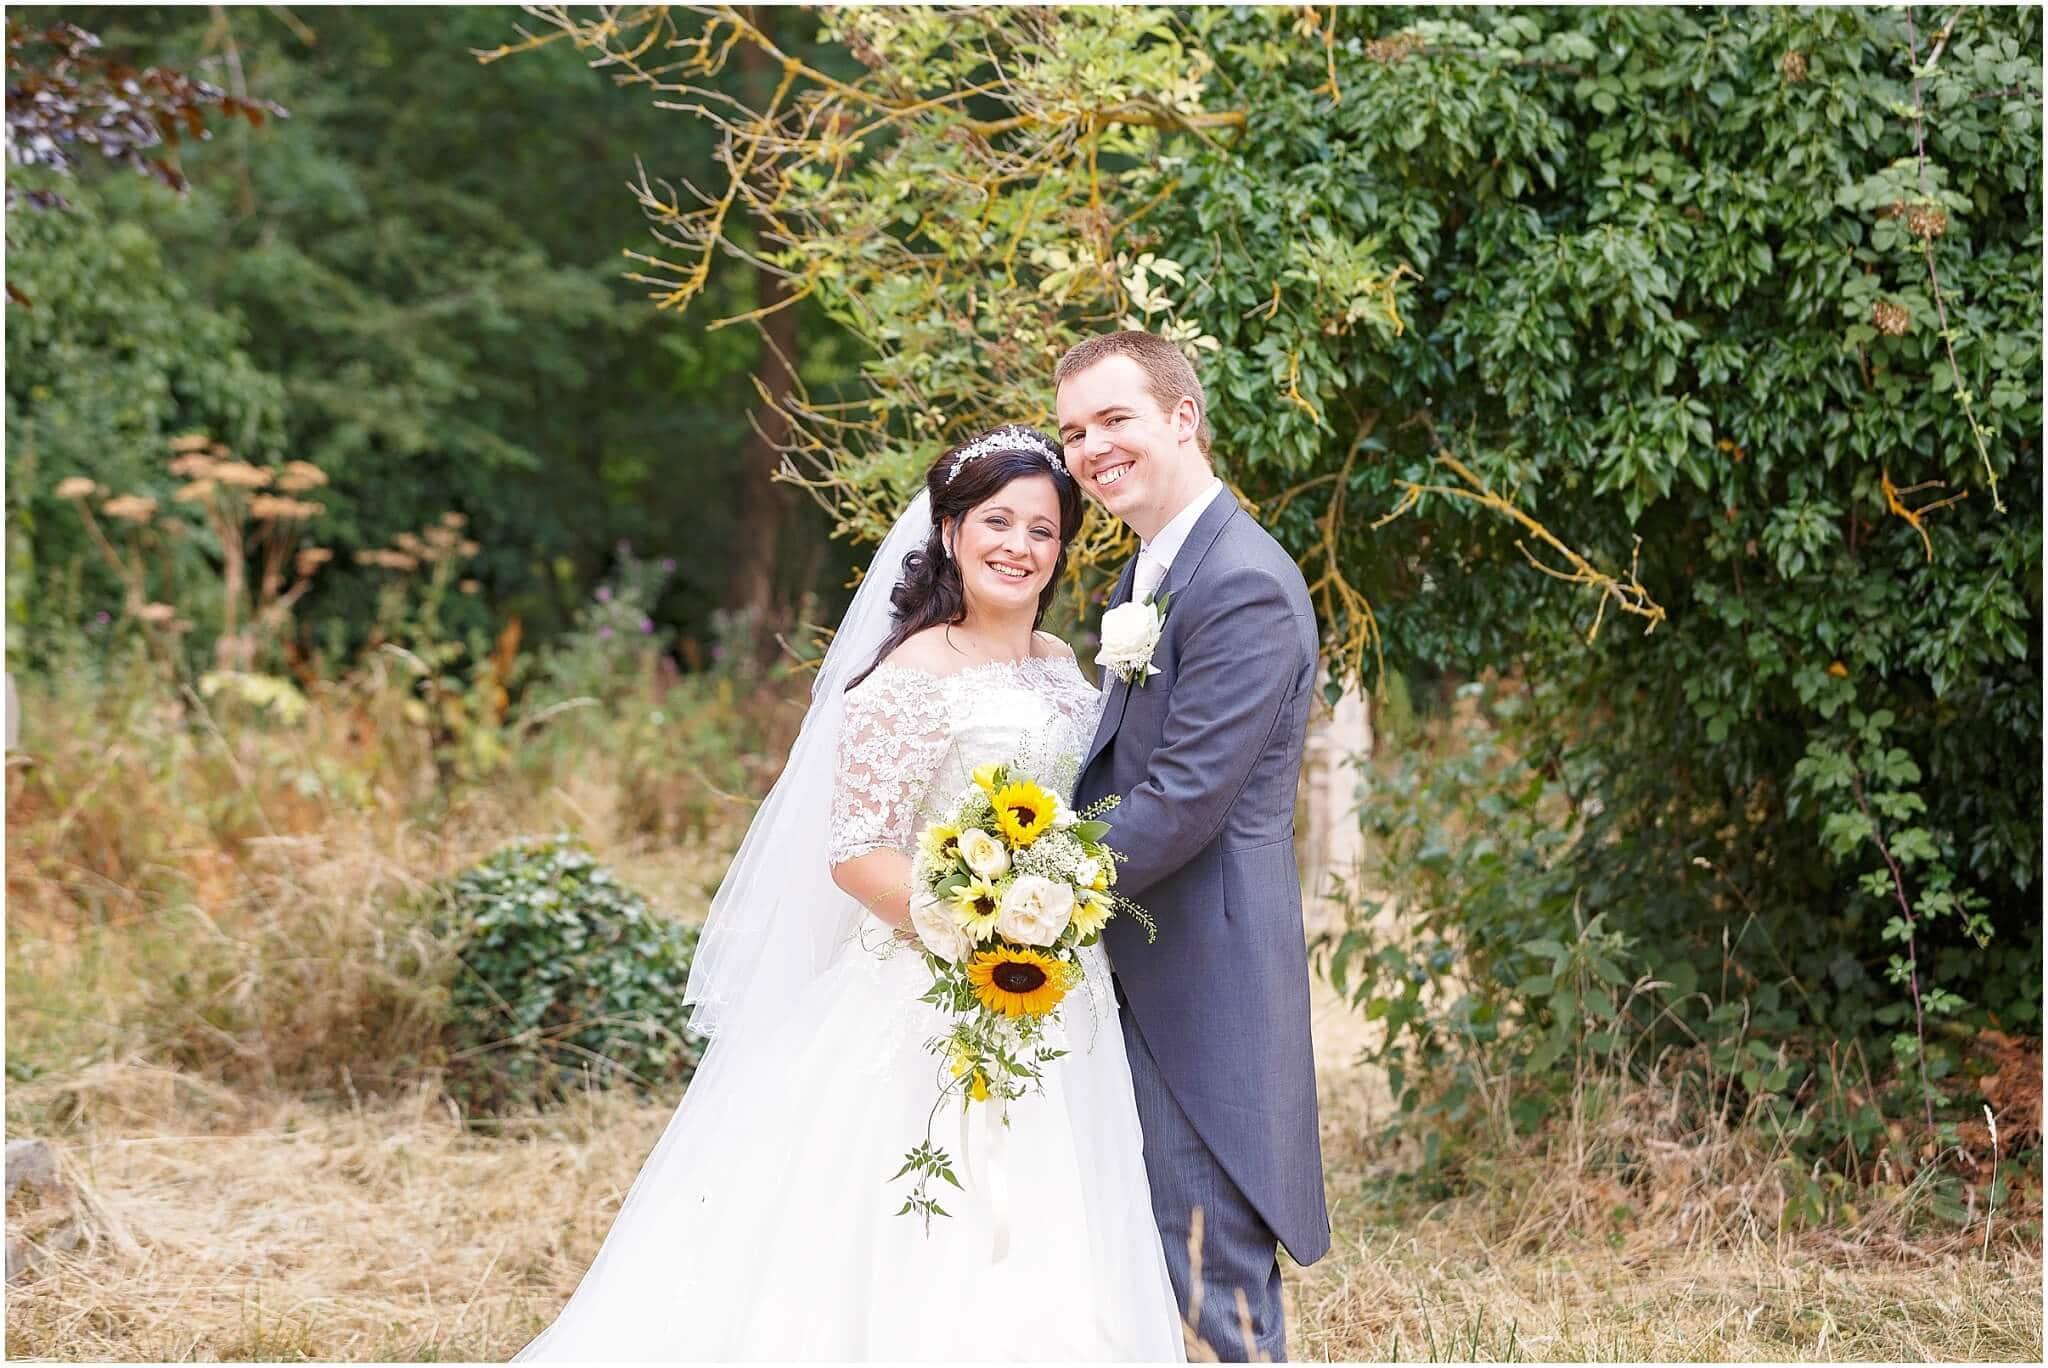 Fleur de lys wedding dress, The Little Flower shed